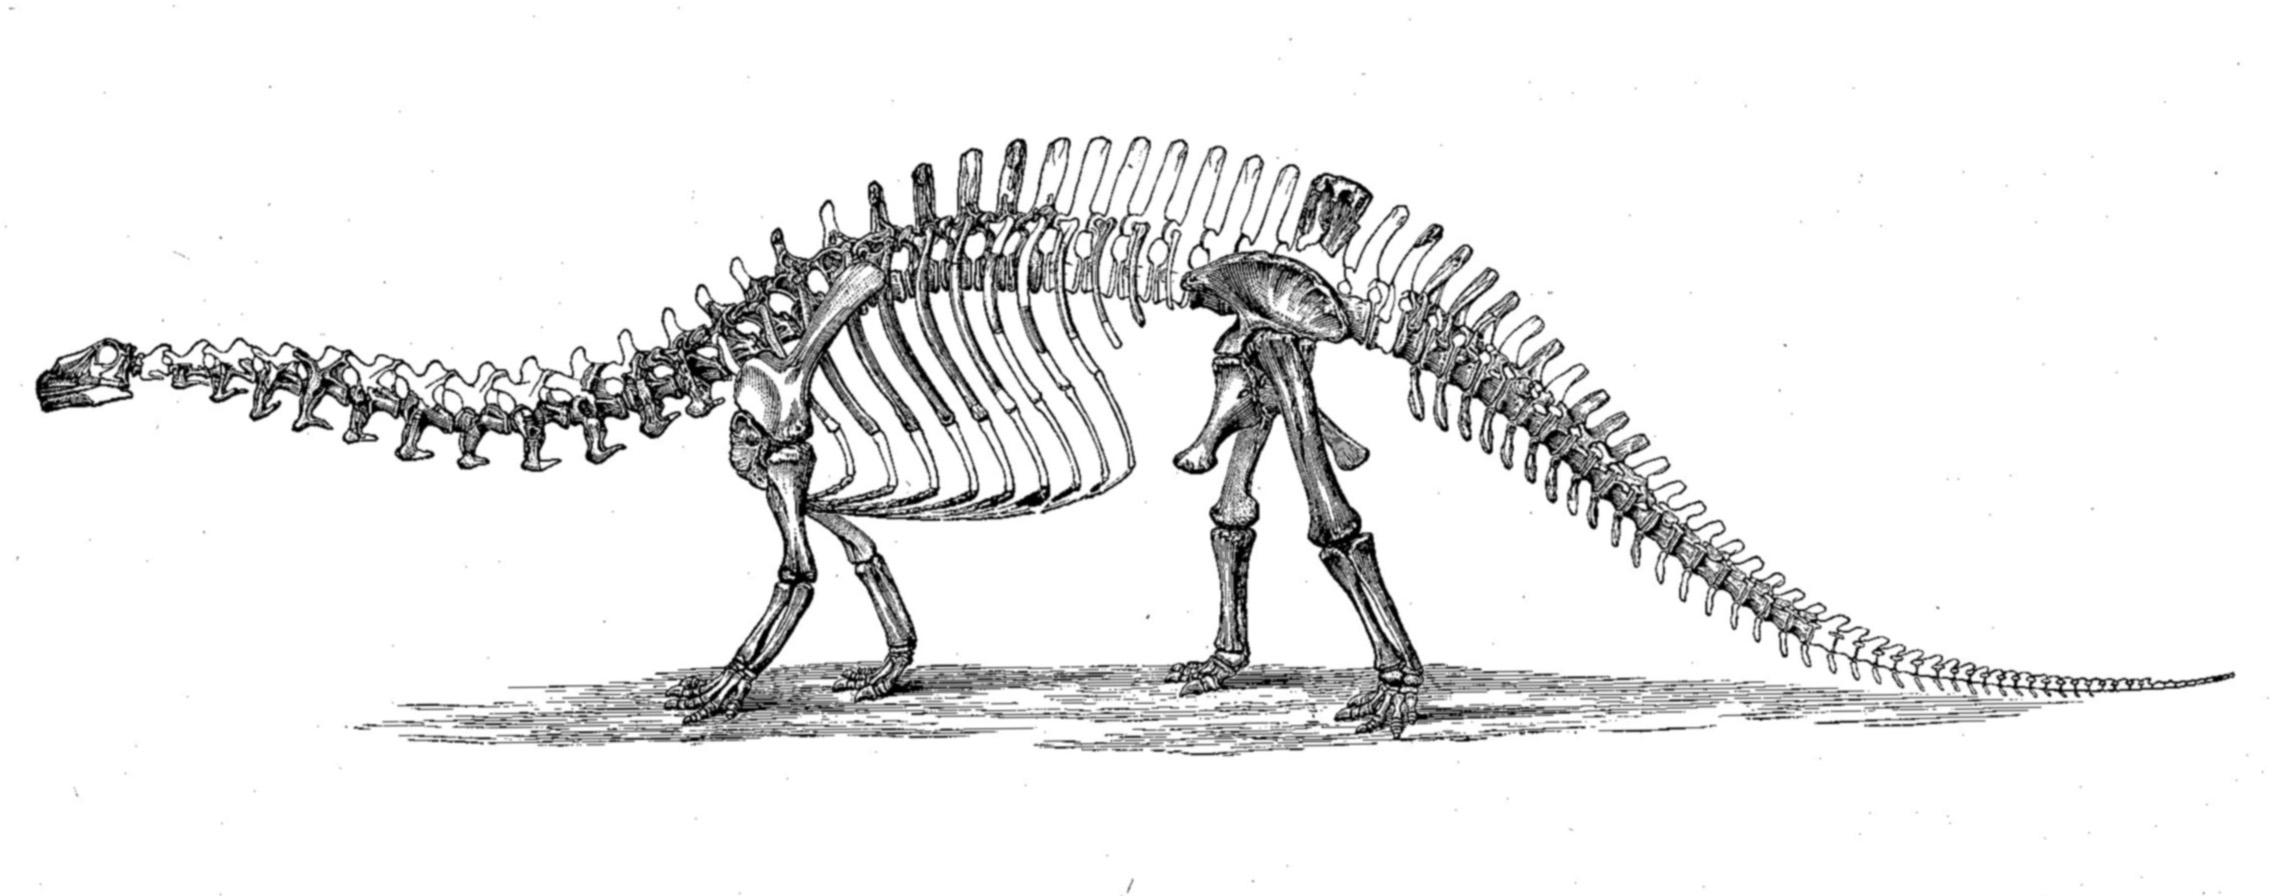 Sleleton clipart brachiosaurus EXTINCT systematics Marsh's Brontosaurus MONSTERS